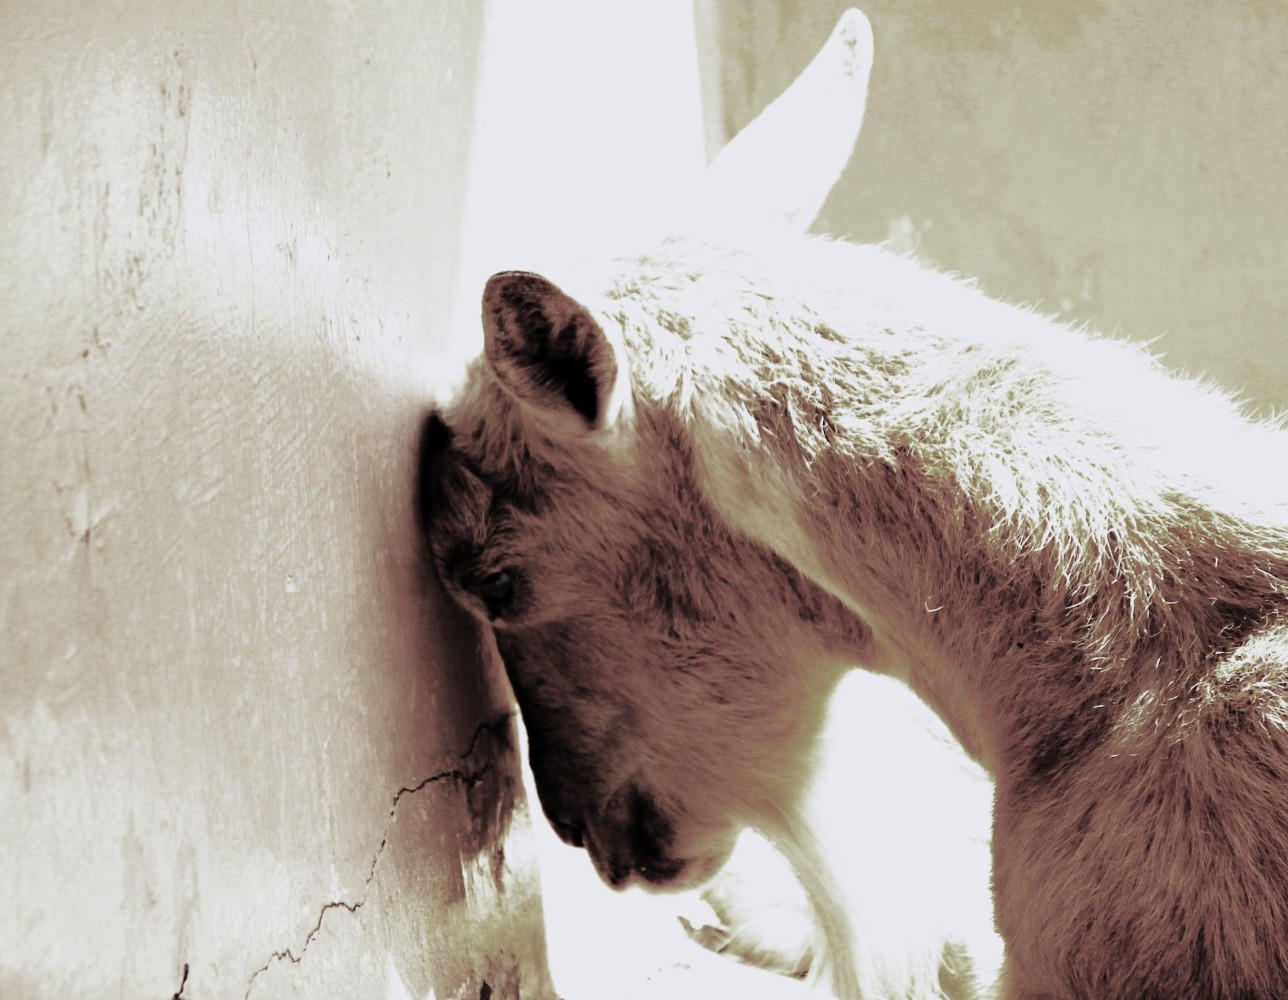 Sad-goat3-e1443061927304